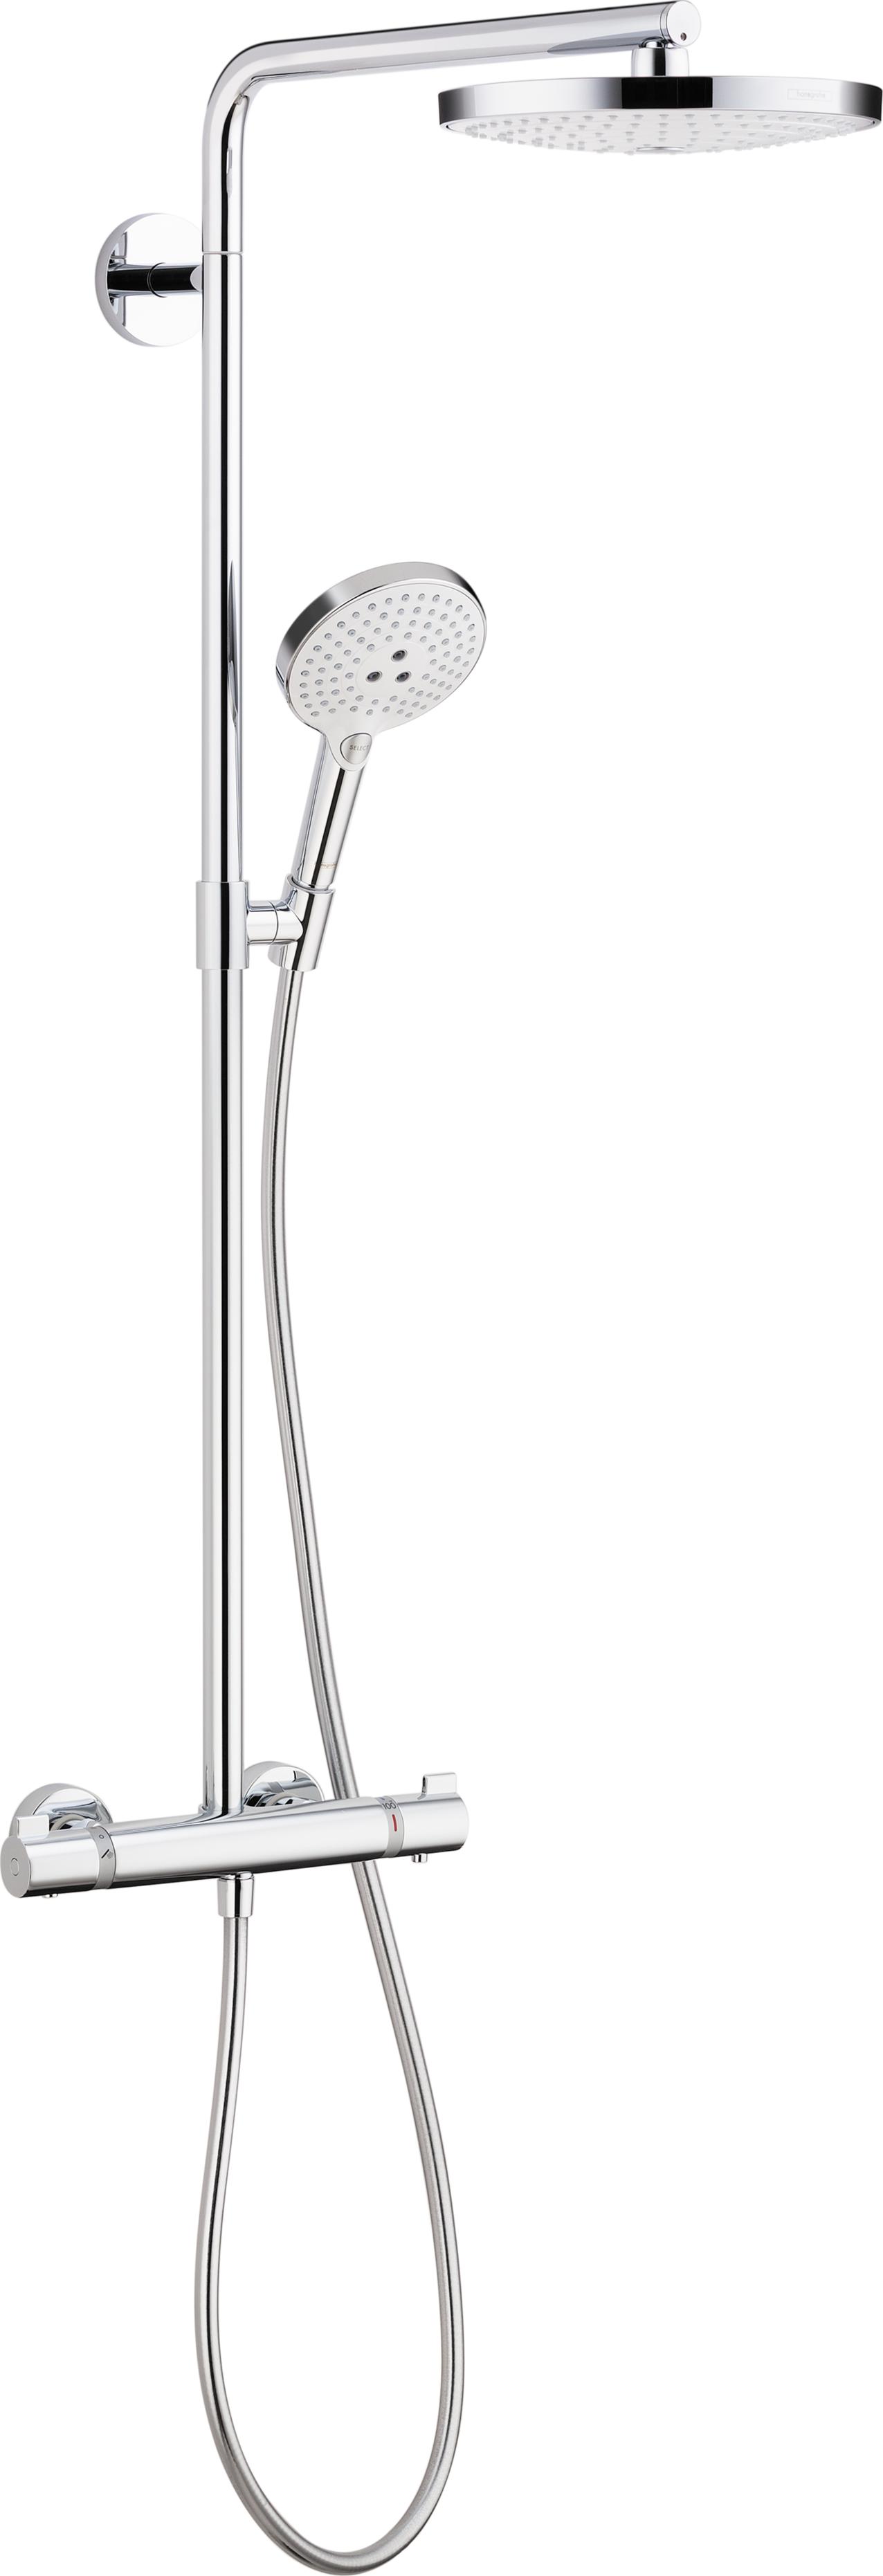 Merveilleux Showerpipe 240 2 Jet, 2.5 GPM